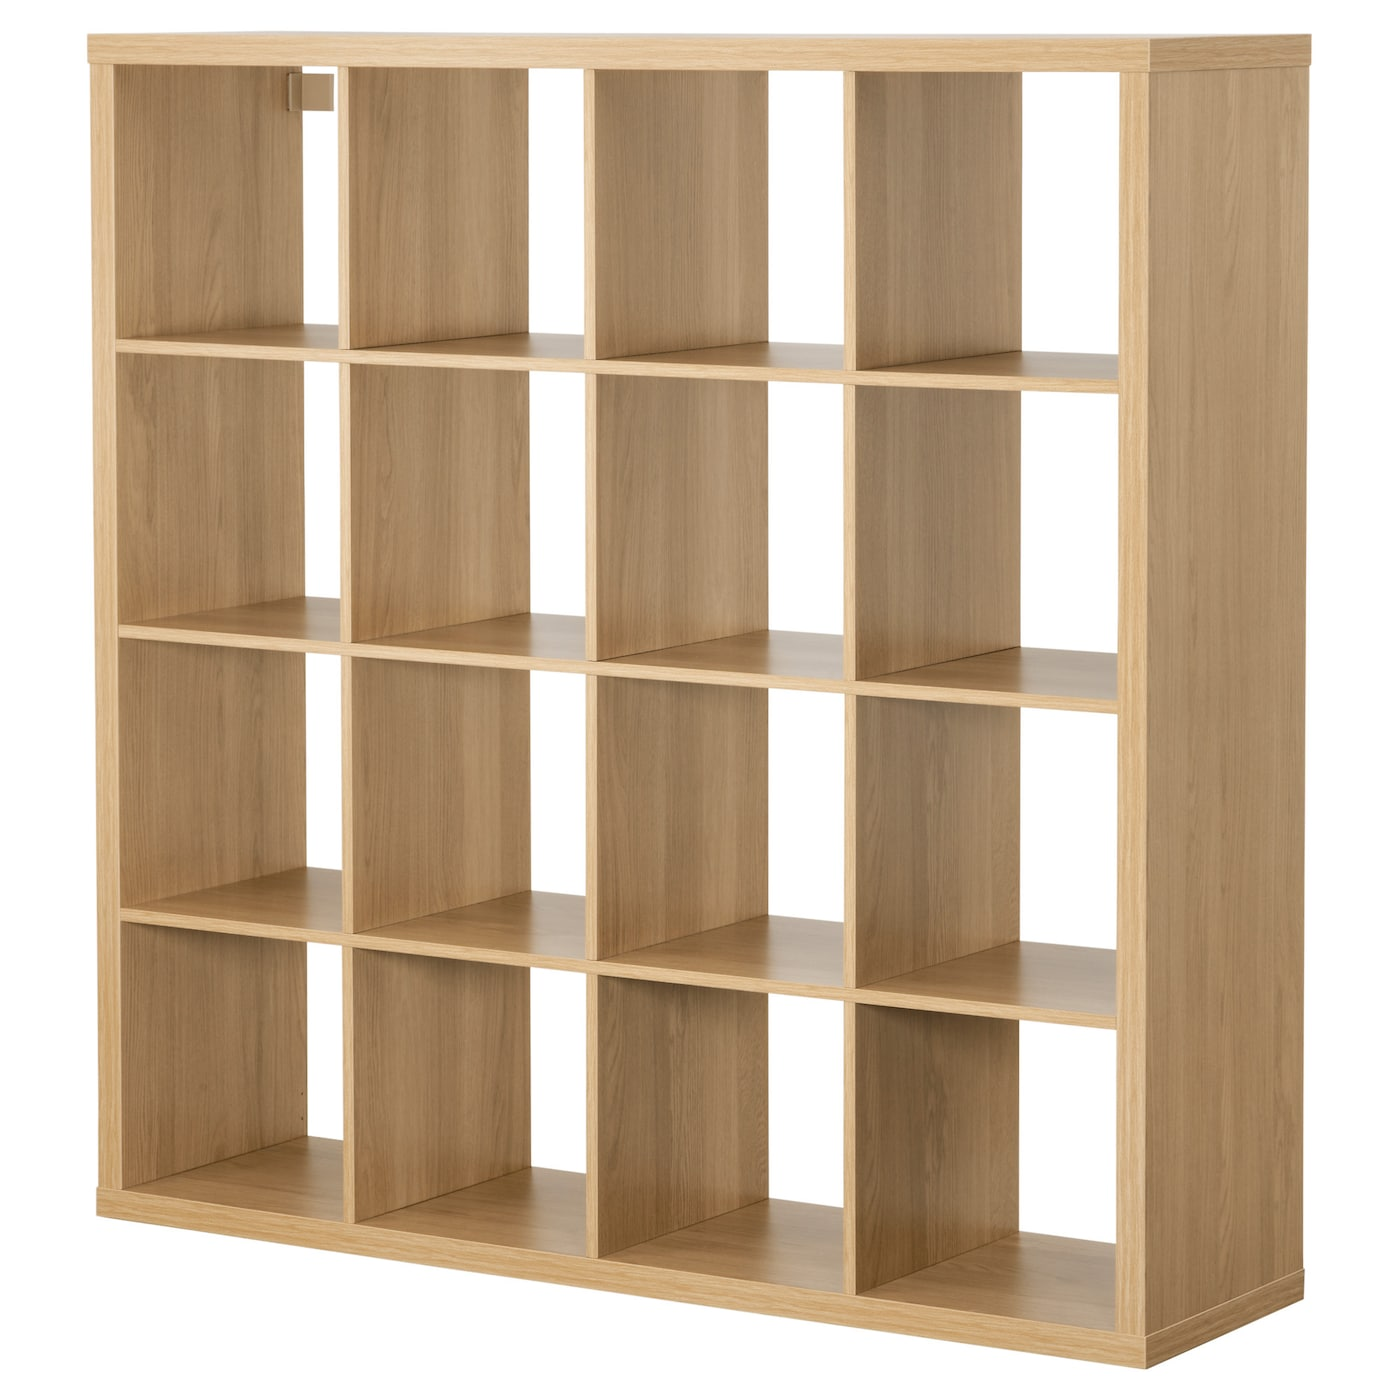 cube storage storage cubes ikea. Black Bedroom Furniture Sets. Home Design Ideas